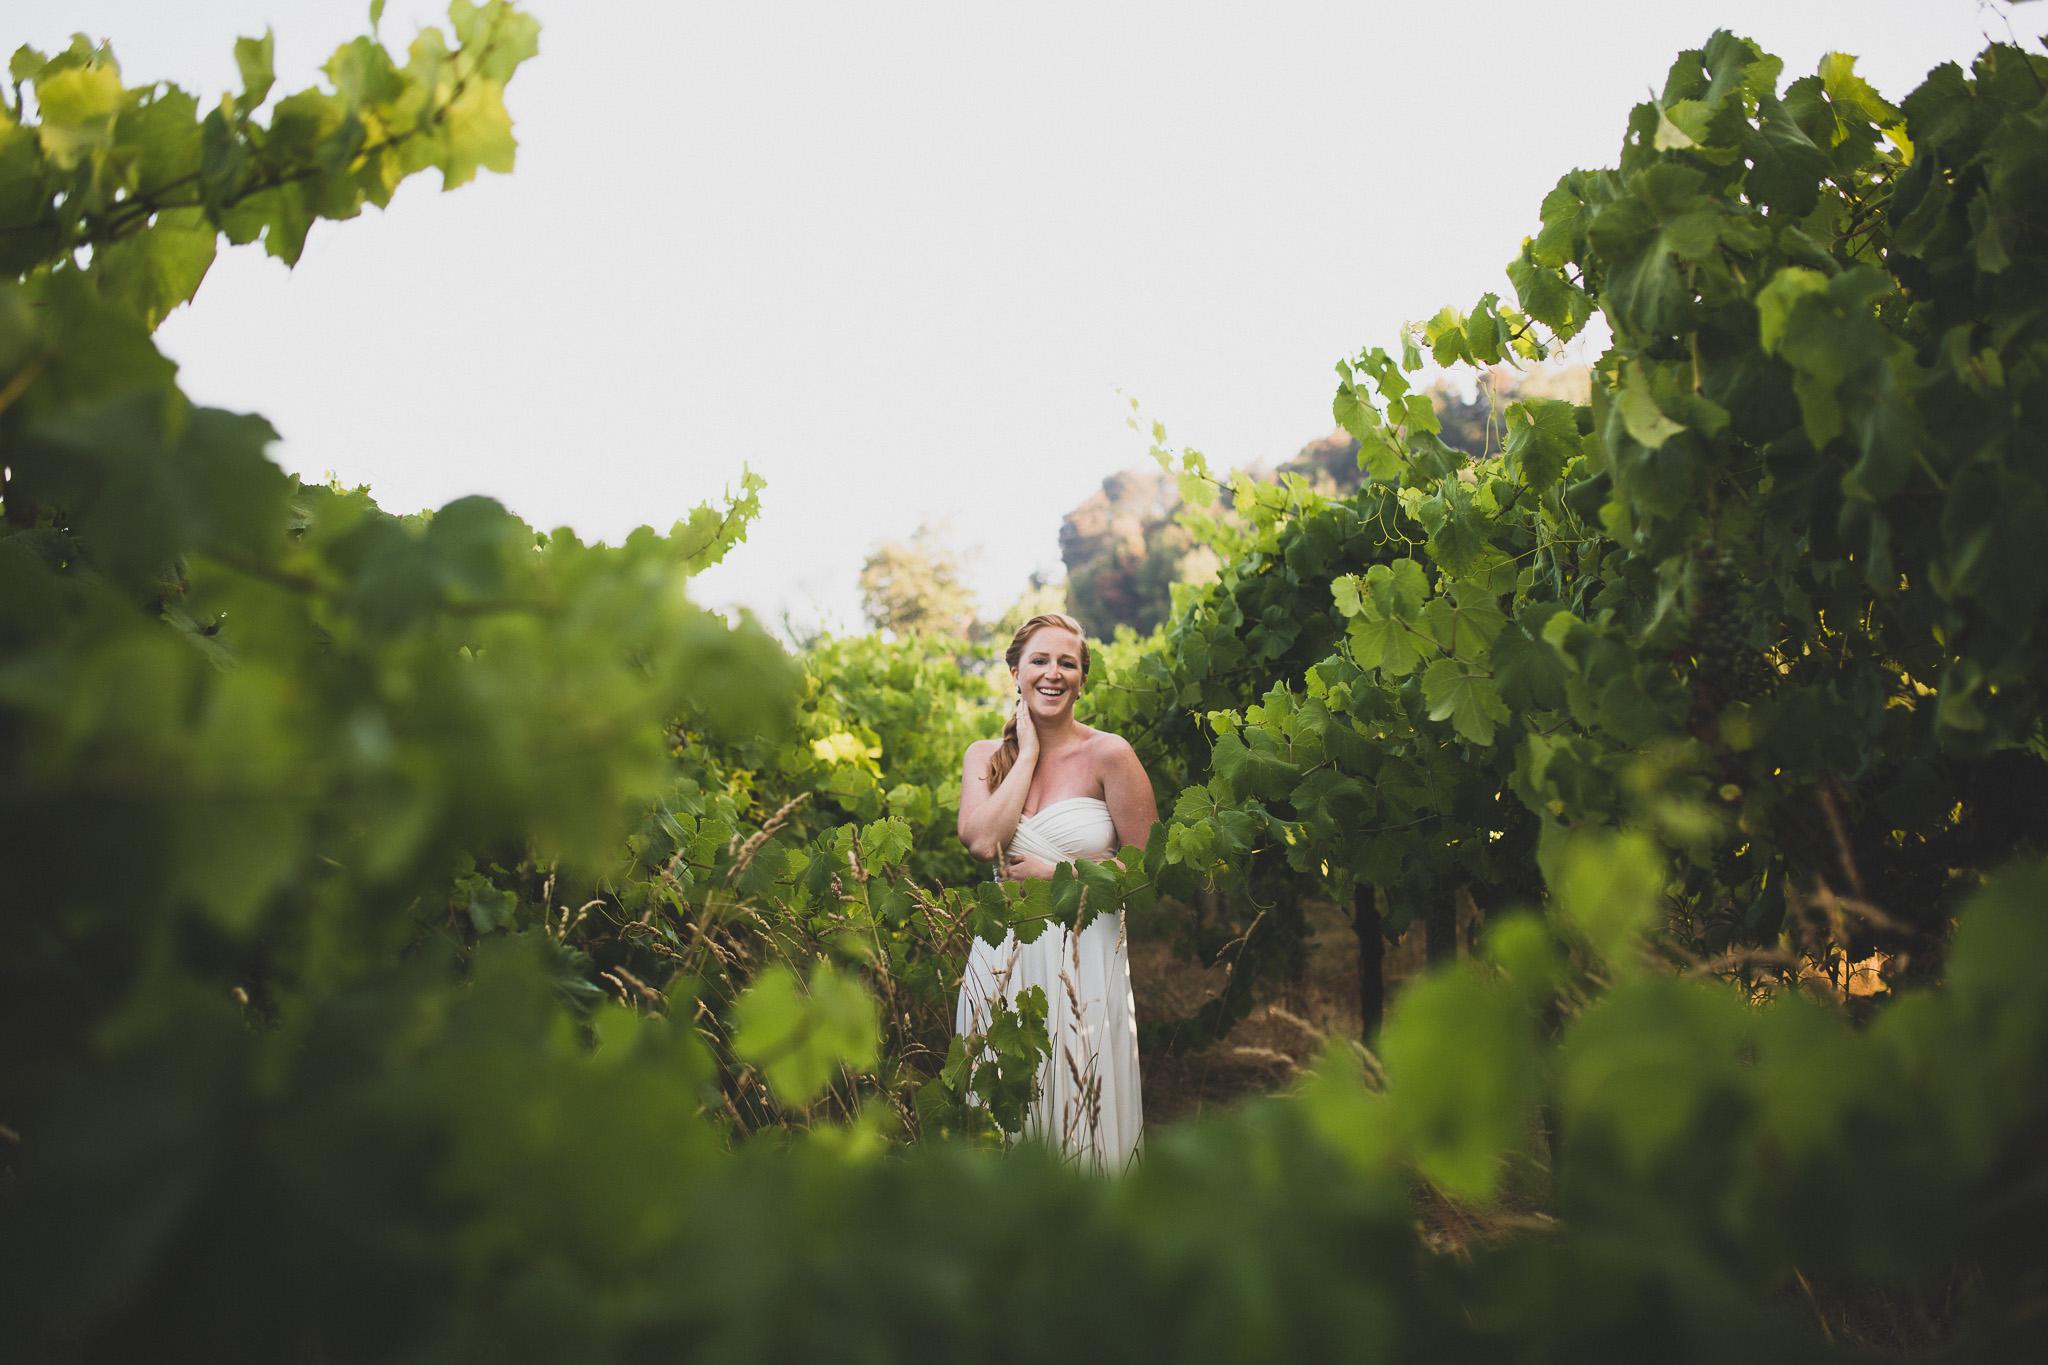 Vinyard wedding portrait in Portugal